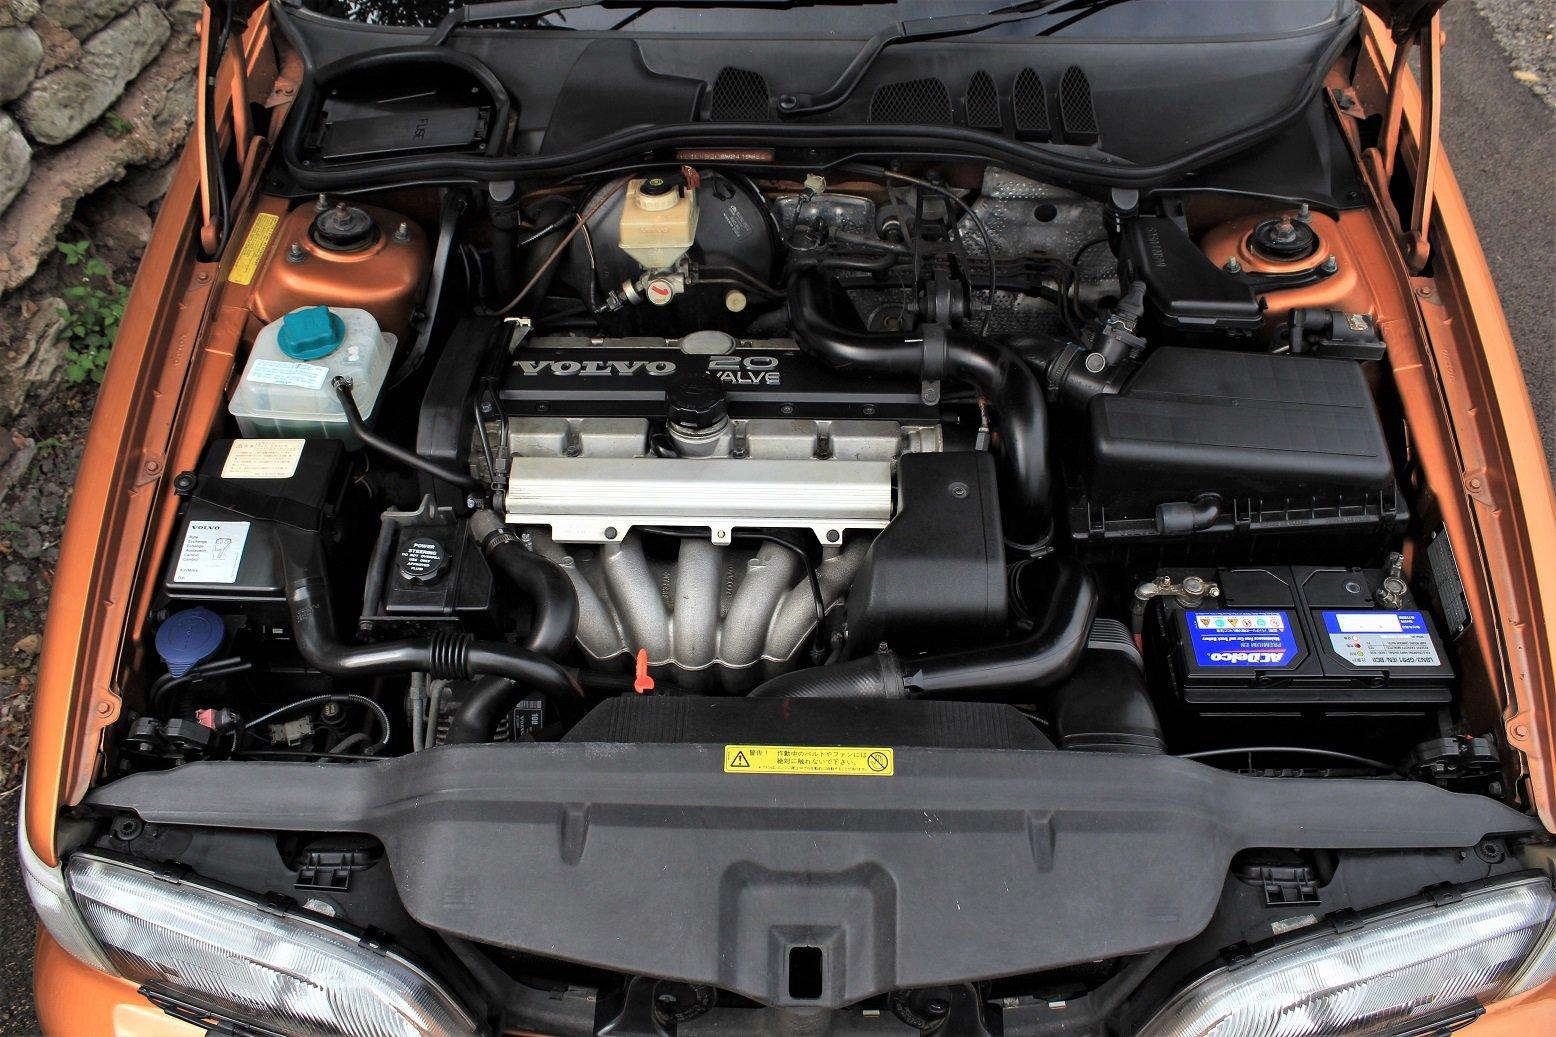 1997 V70R Estate - 4WD 2.4L 20V Turbo 240 bhp. Concourse Cond. For Sale (picture 6 of 6)